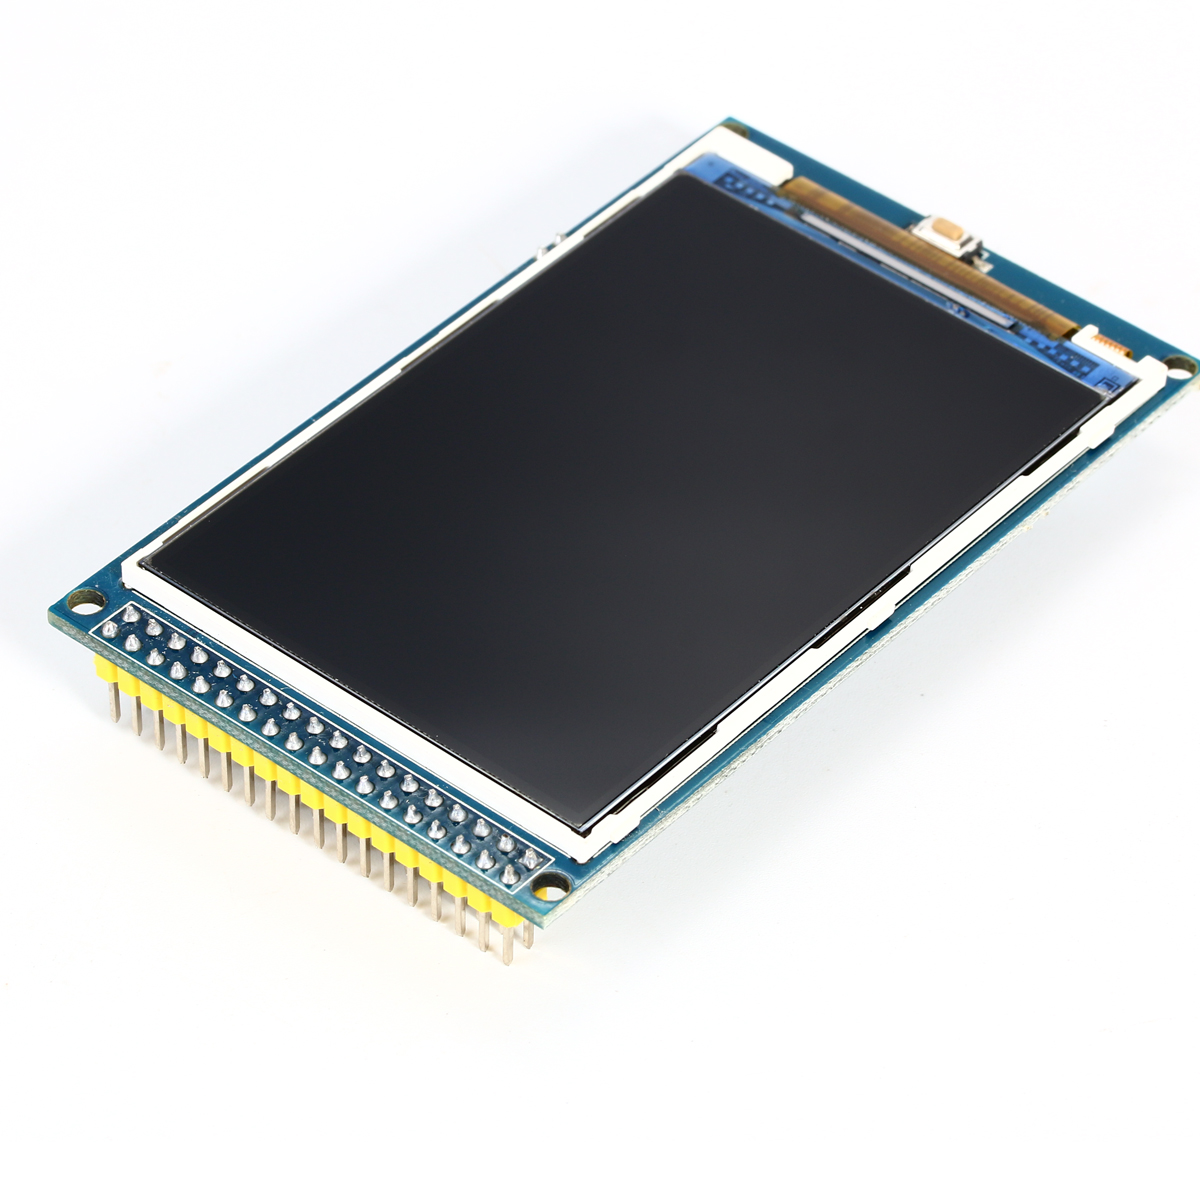 "3.2"" TFT Color Screen Module 320x480 LCD Screen for Arduino Mega2560 TE284(China (Mainland))"